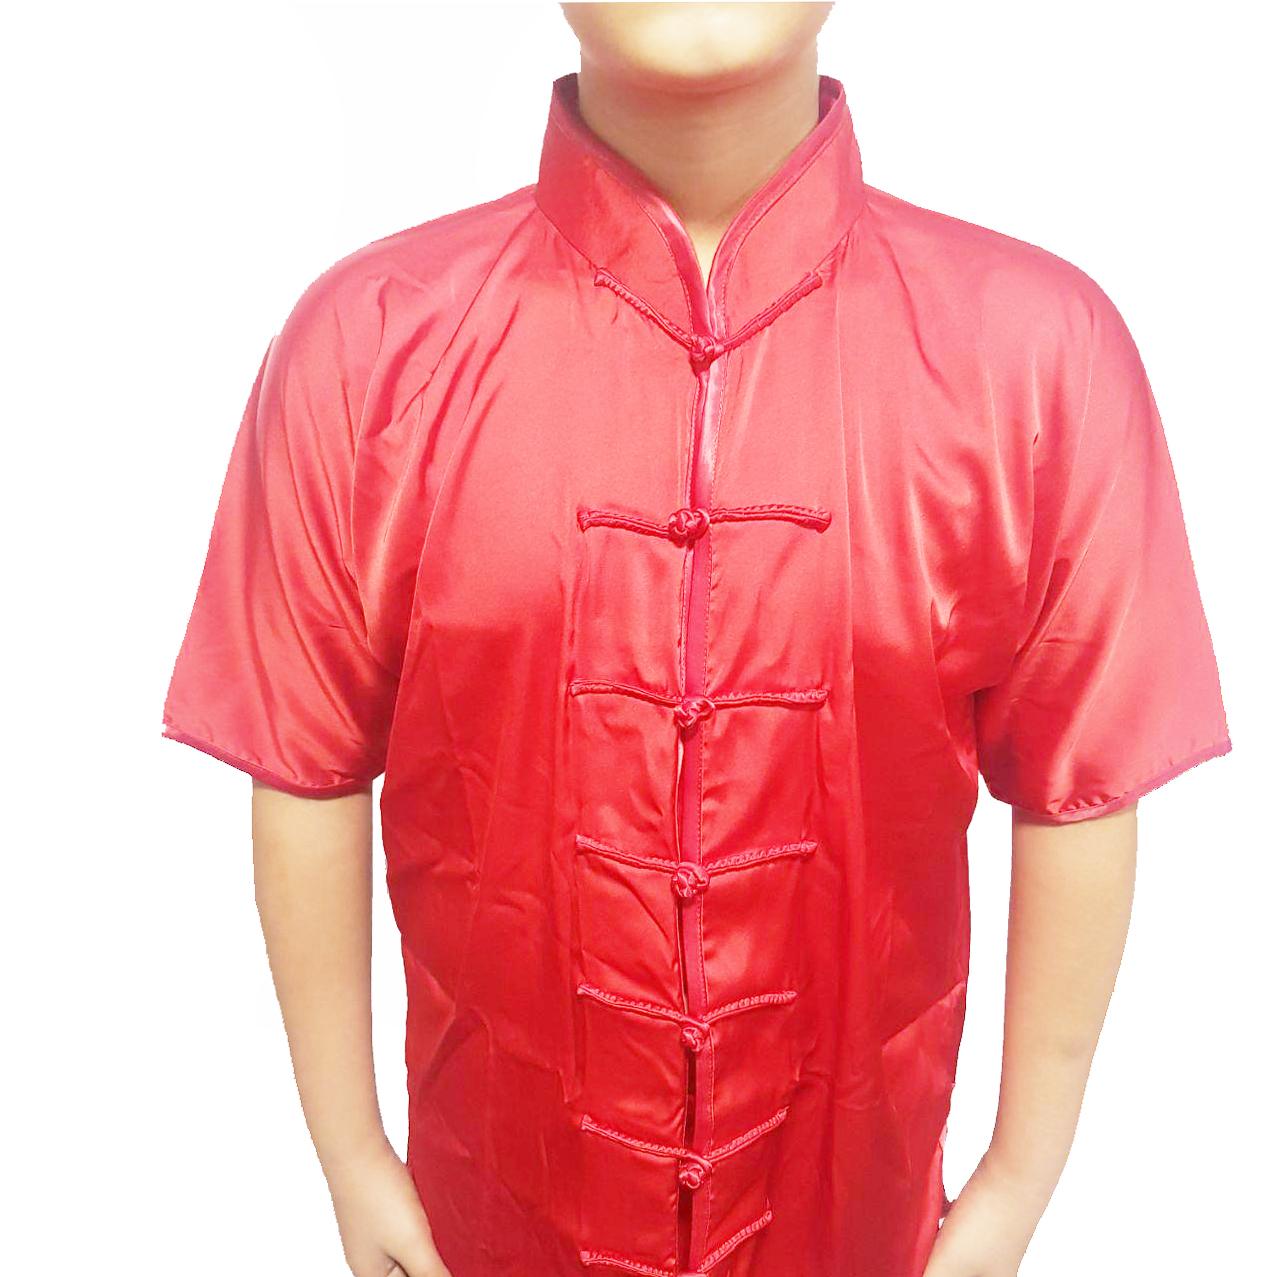 لباس چانگ چوان ووشو قرمز